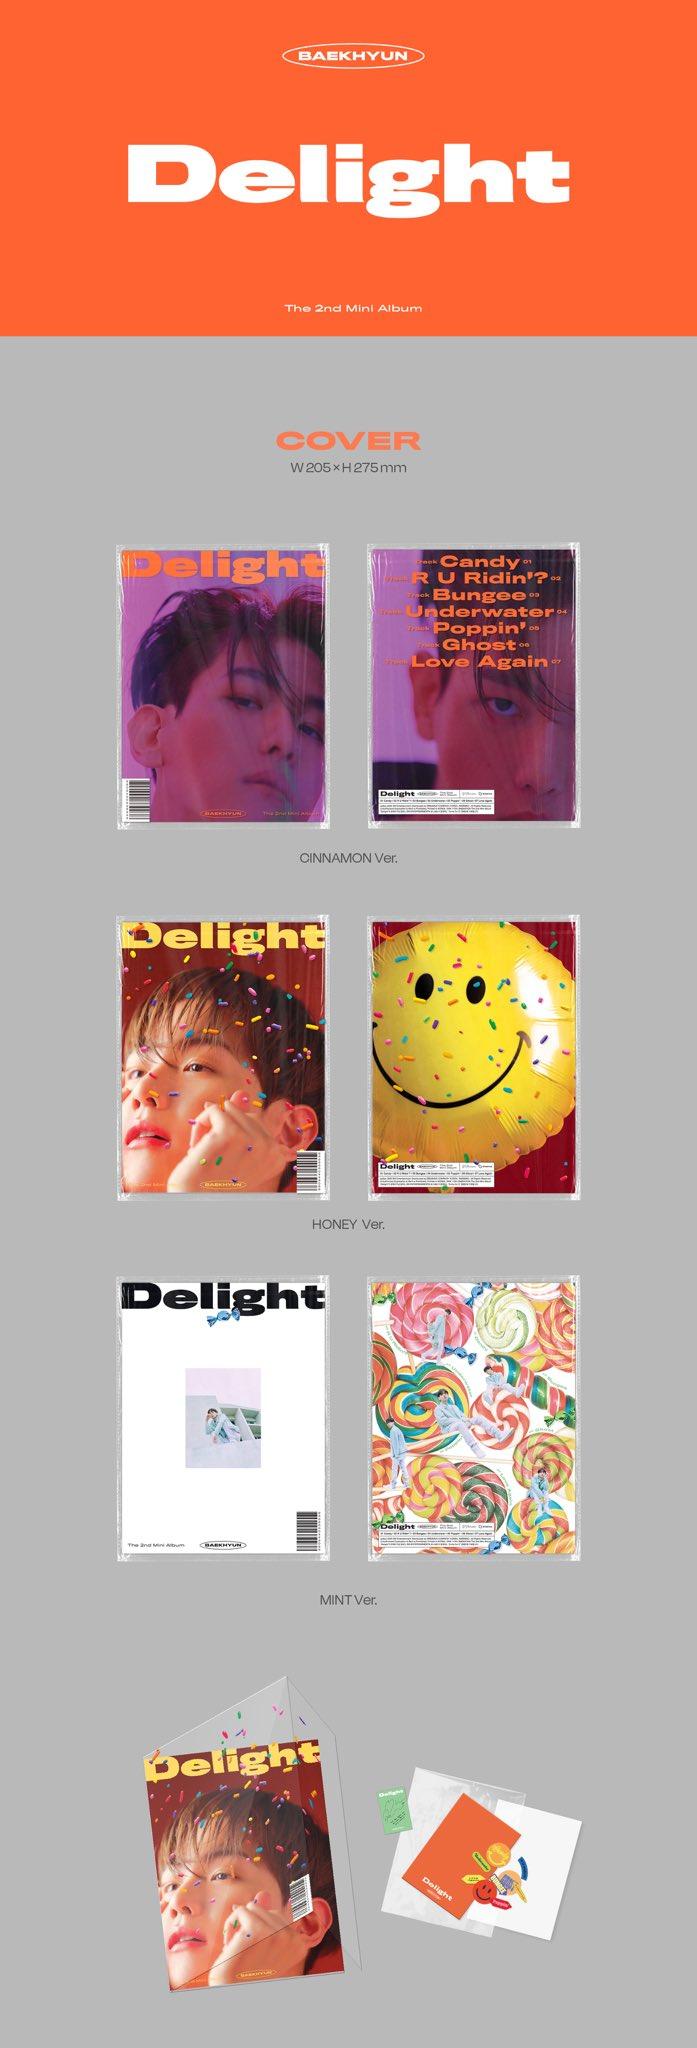 "EXO on Twitter: ""백현 BAEKHYUN The 2nd Mini Album ['Delight ..."